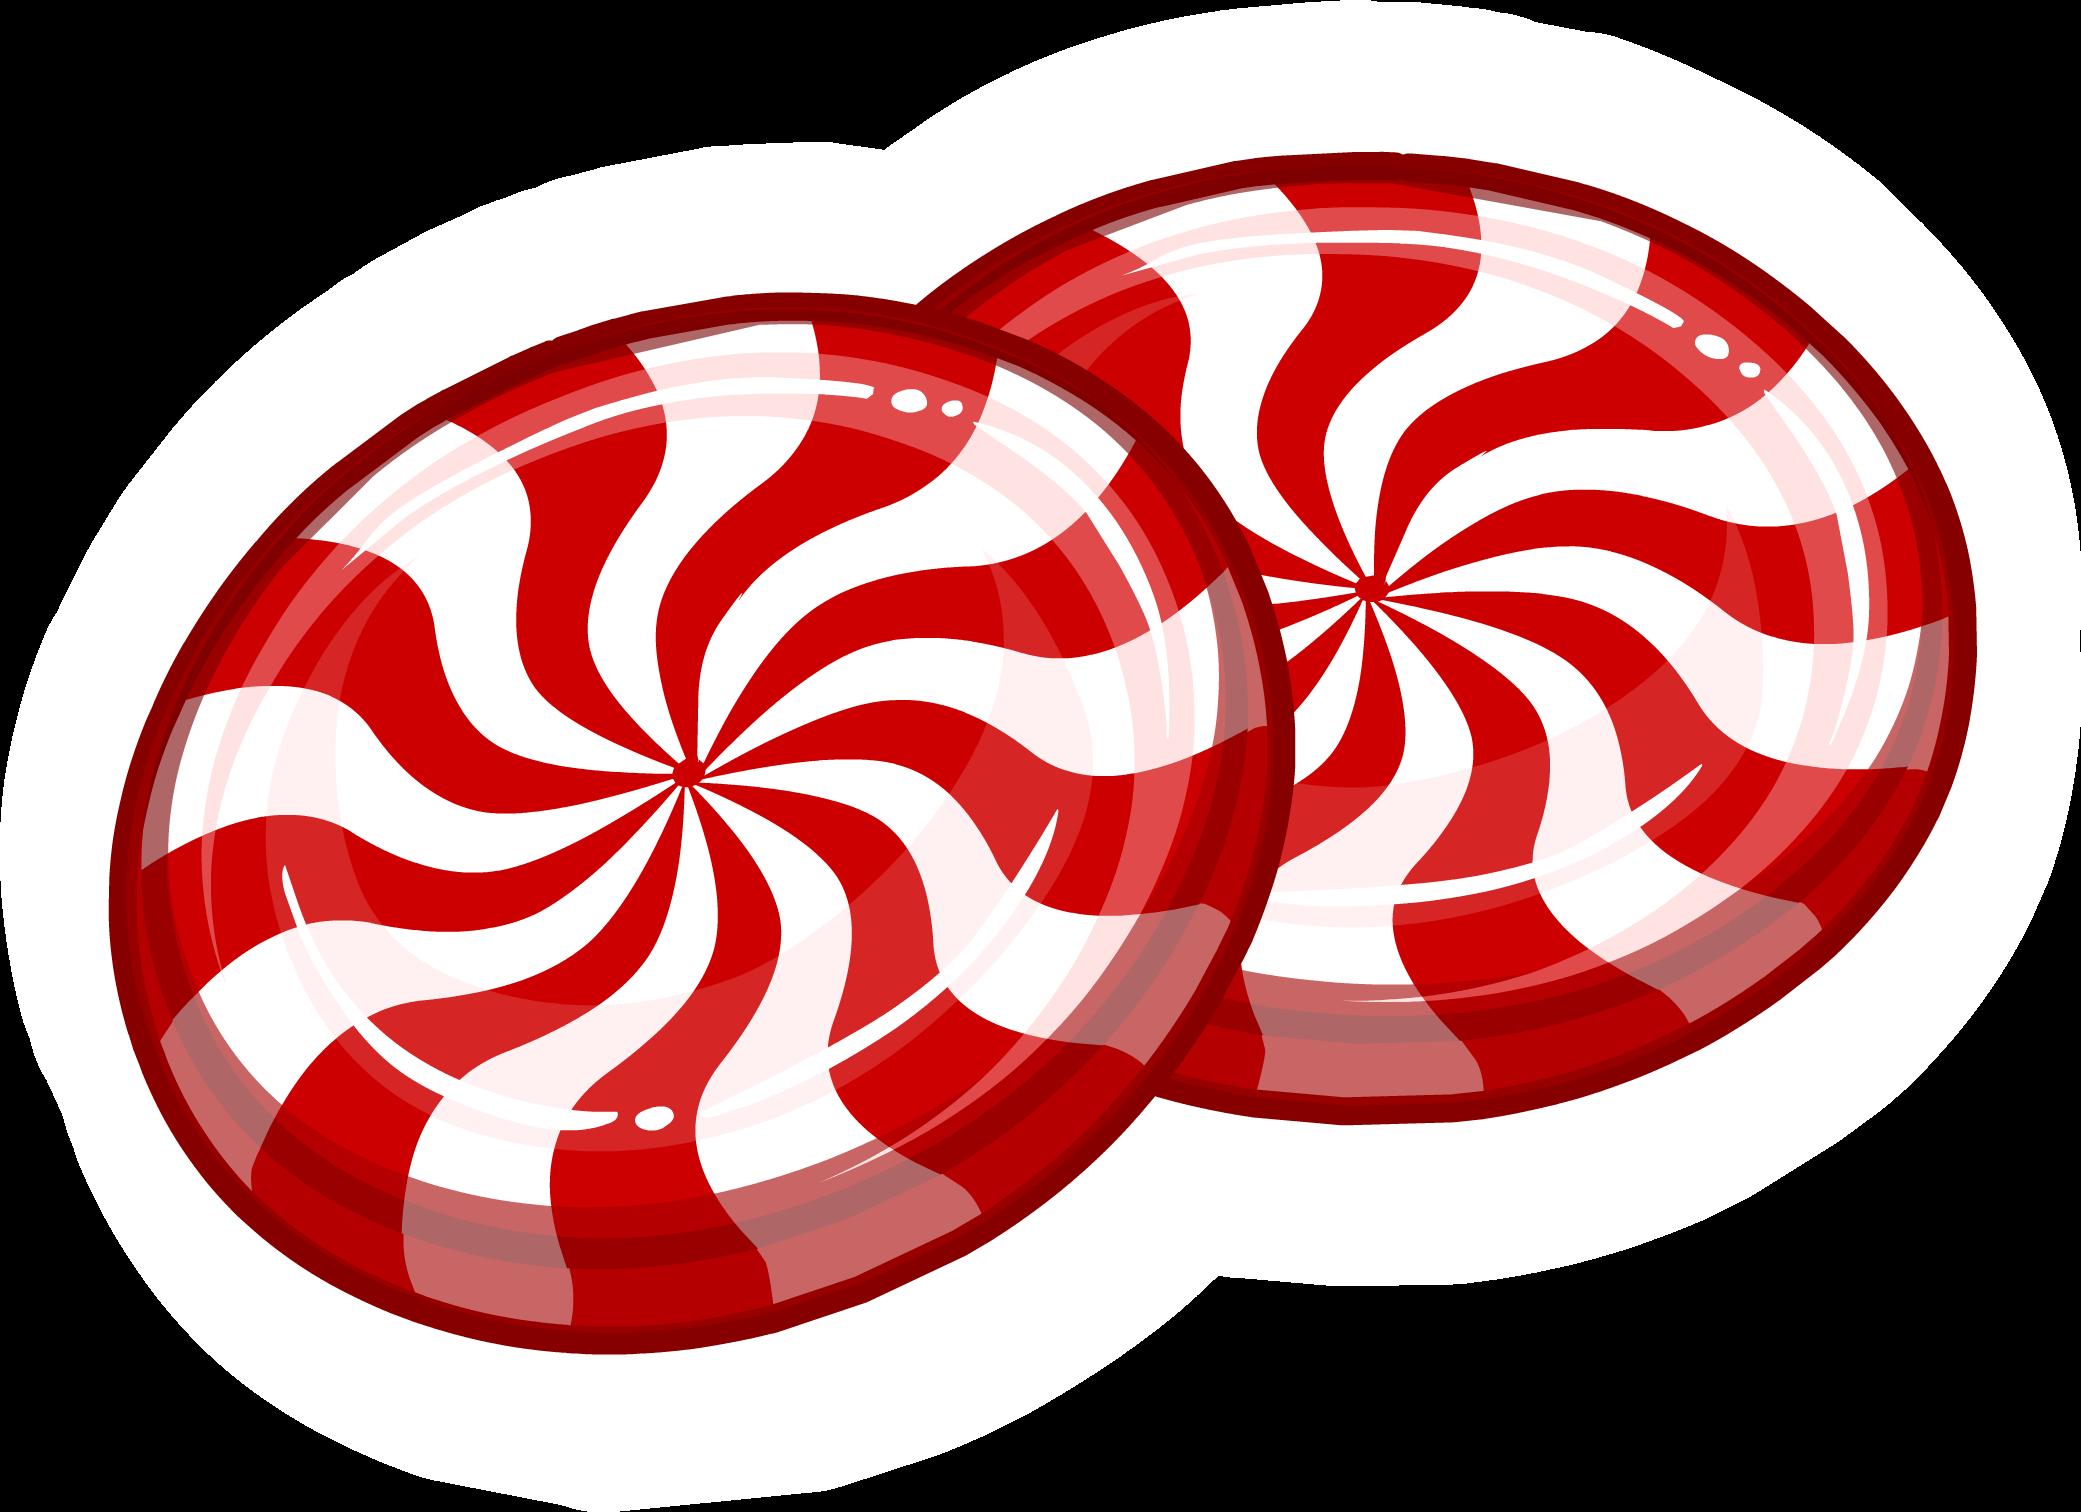 Candy Swirl Pin